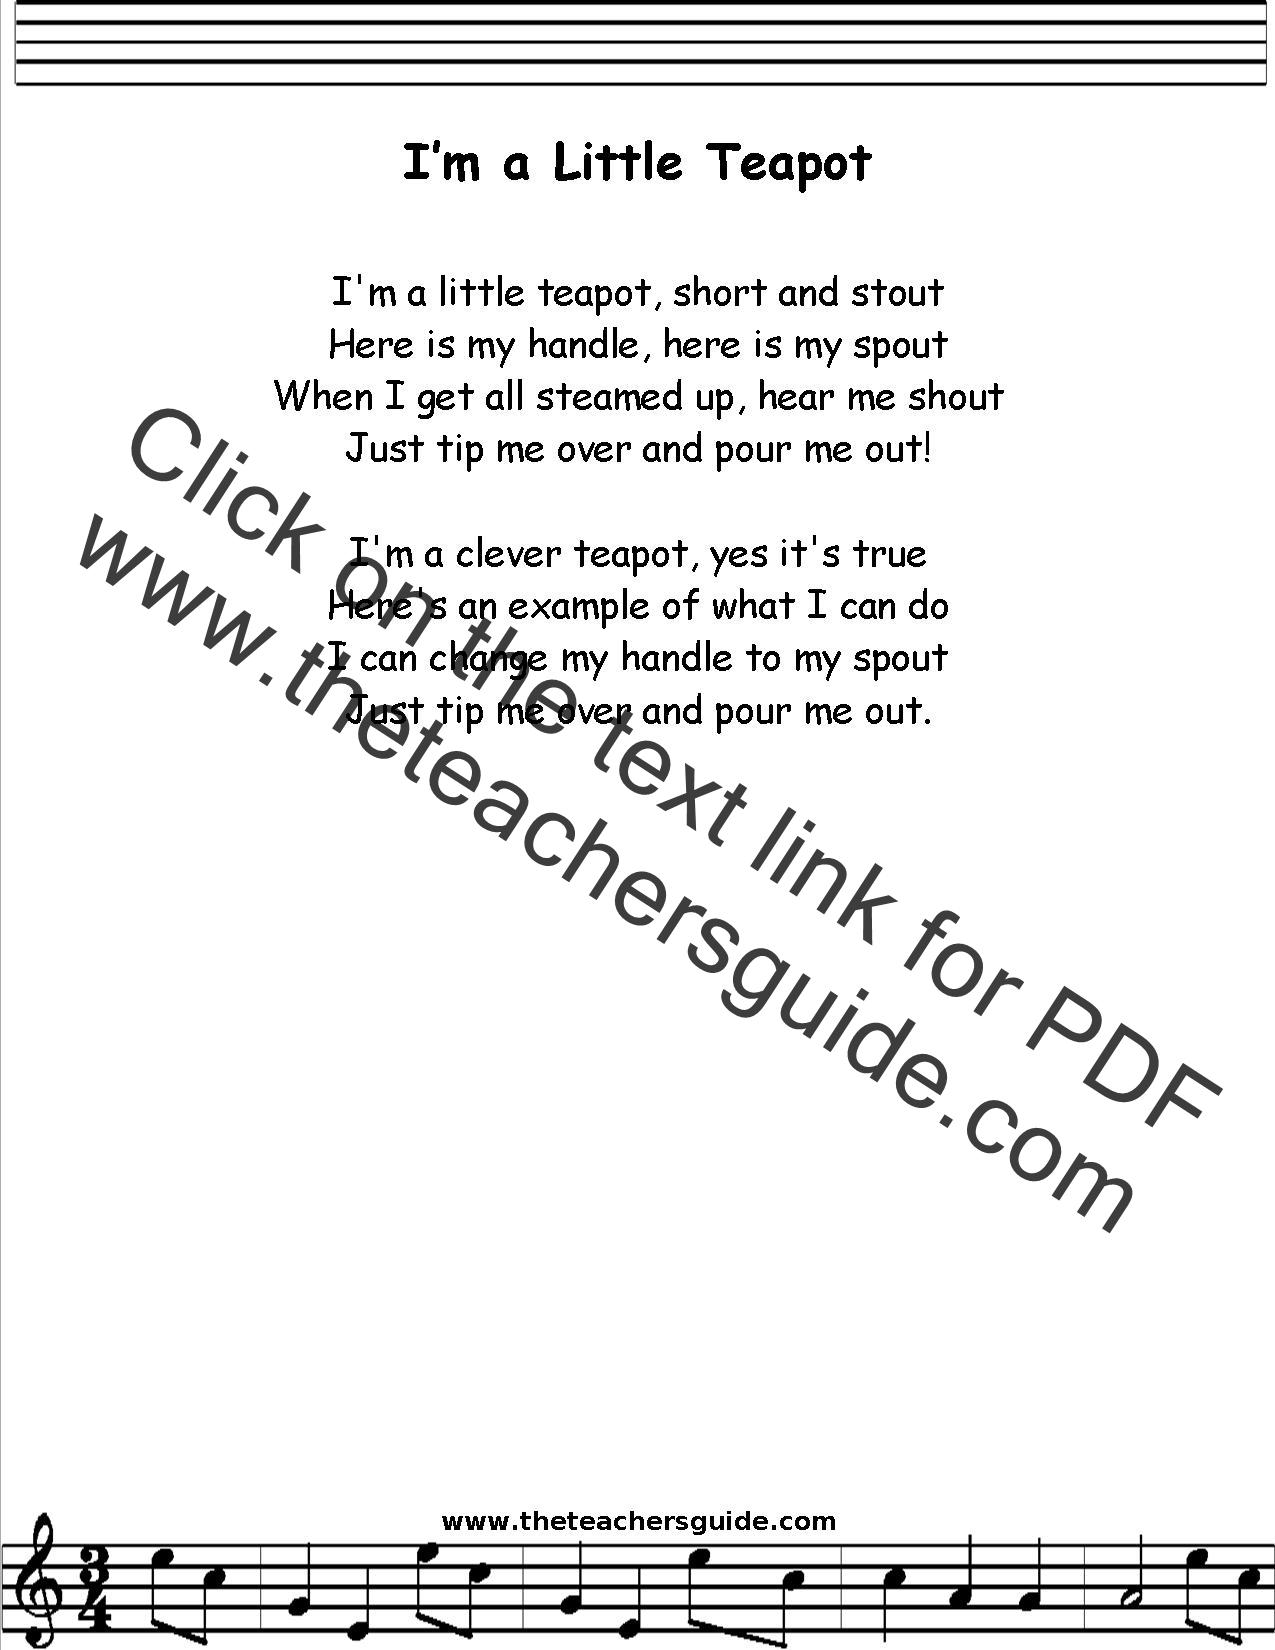 I M A Little Teapot Lyrics Printout Midi And Video